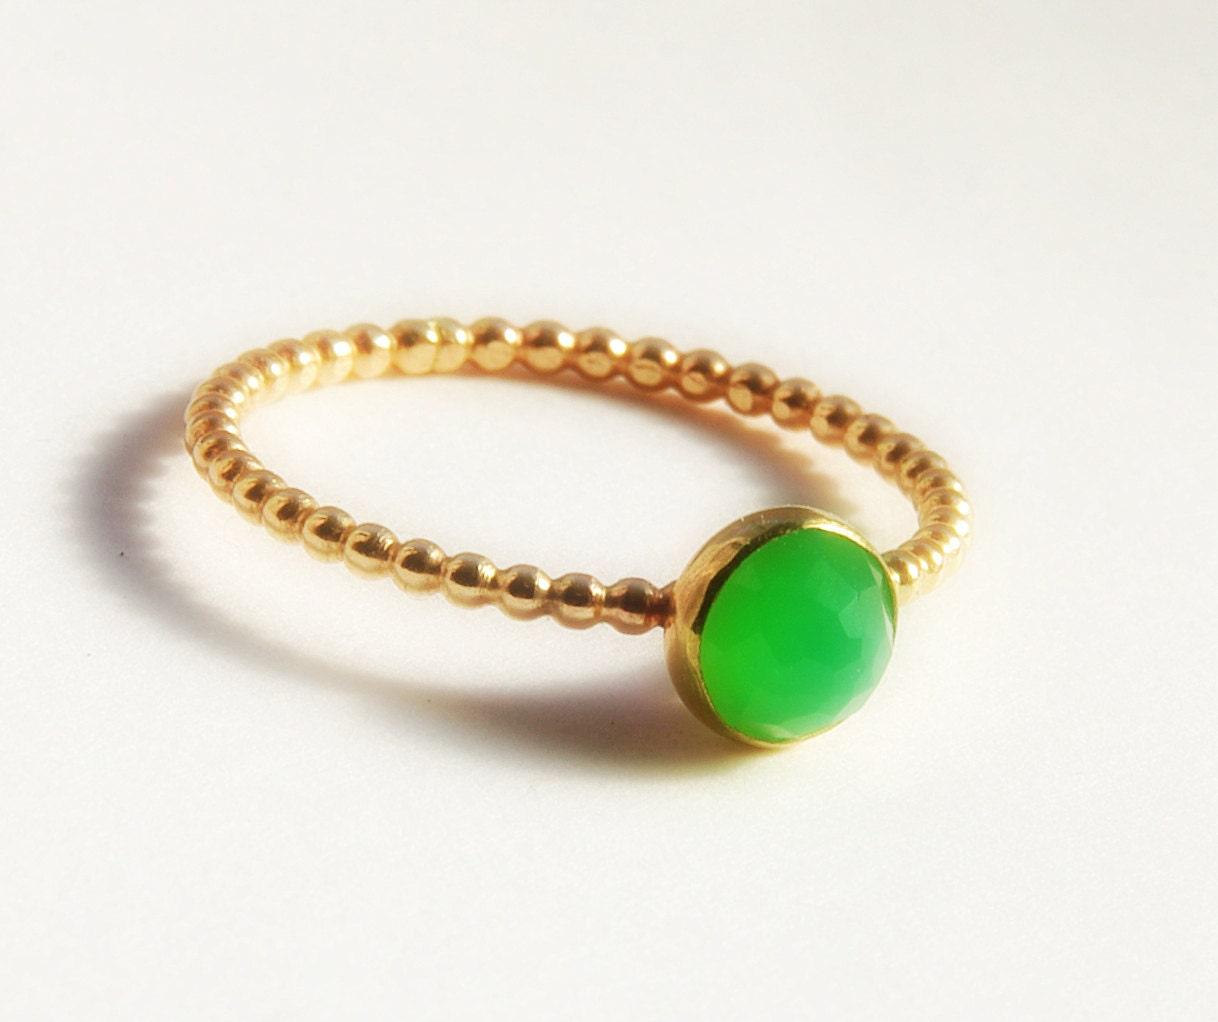 rose cut green chrysoprase gemstone ring stackable gold ring. Black Bedroom Furniture Sets. Home Design Ideas